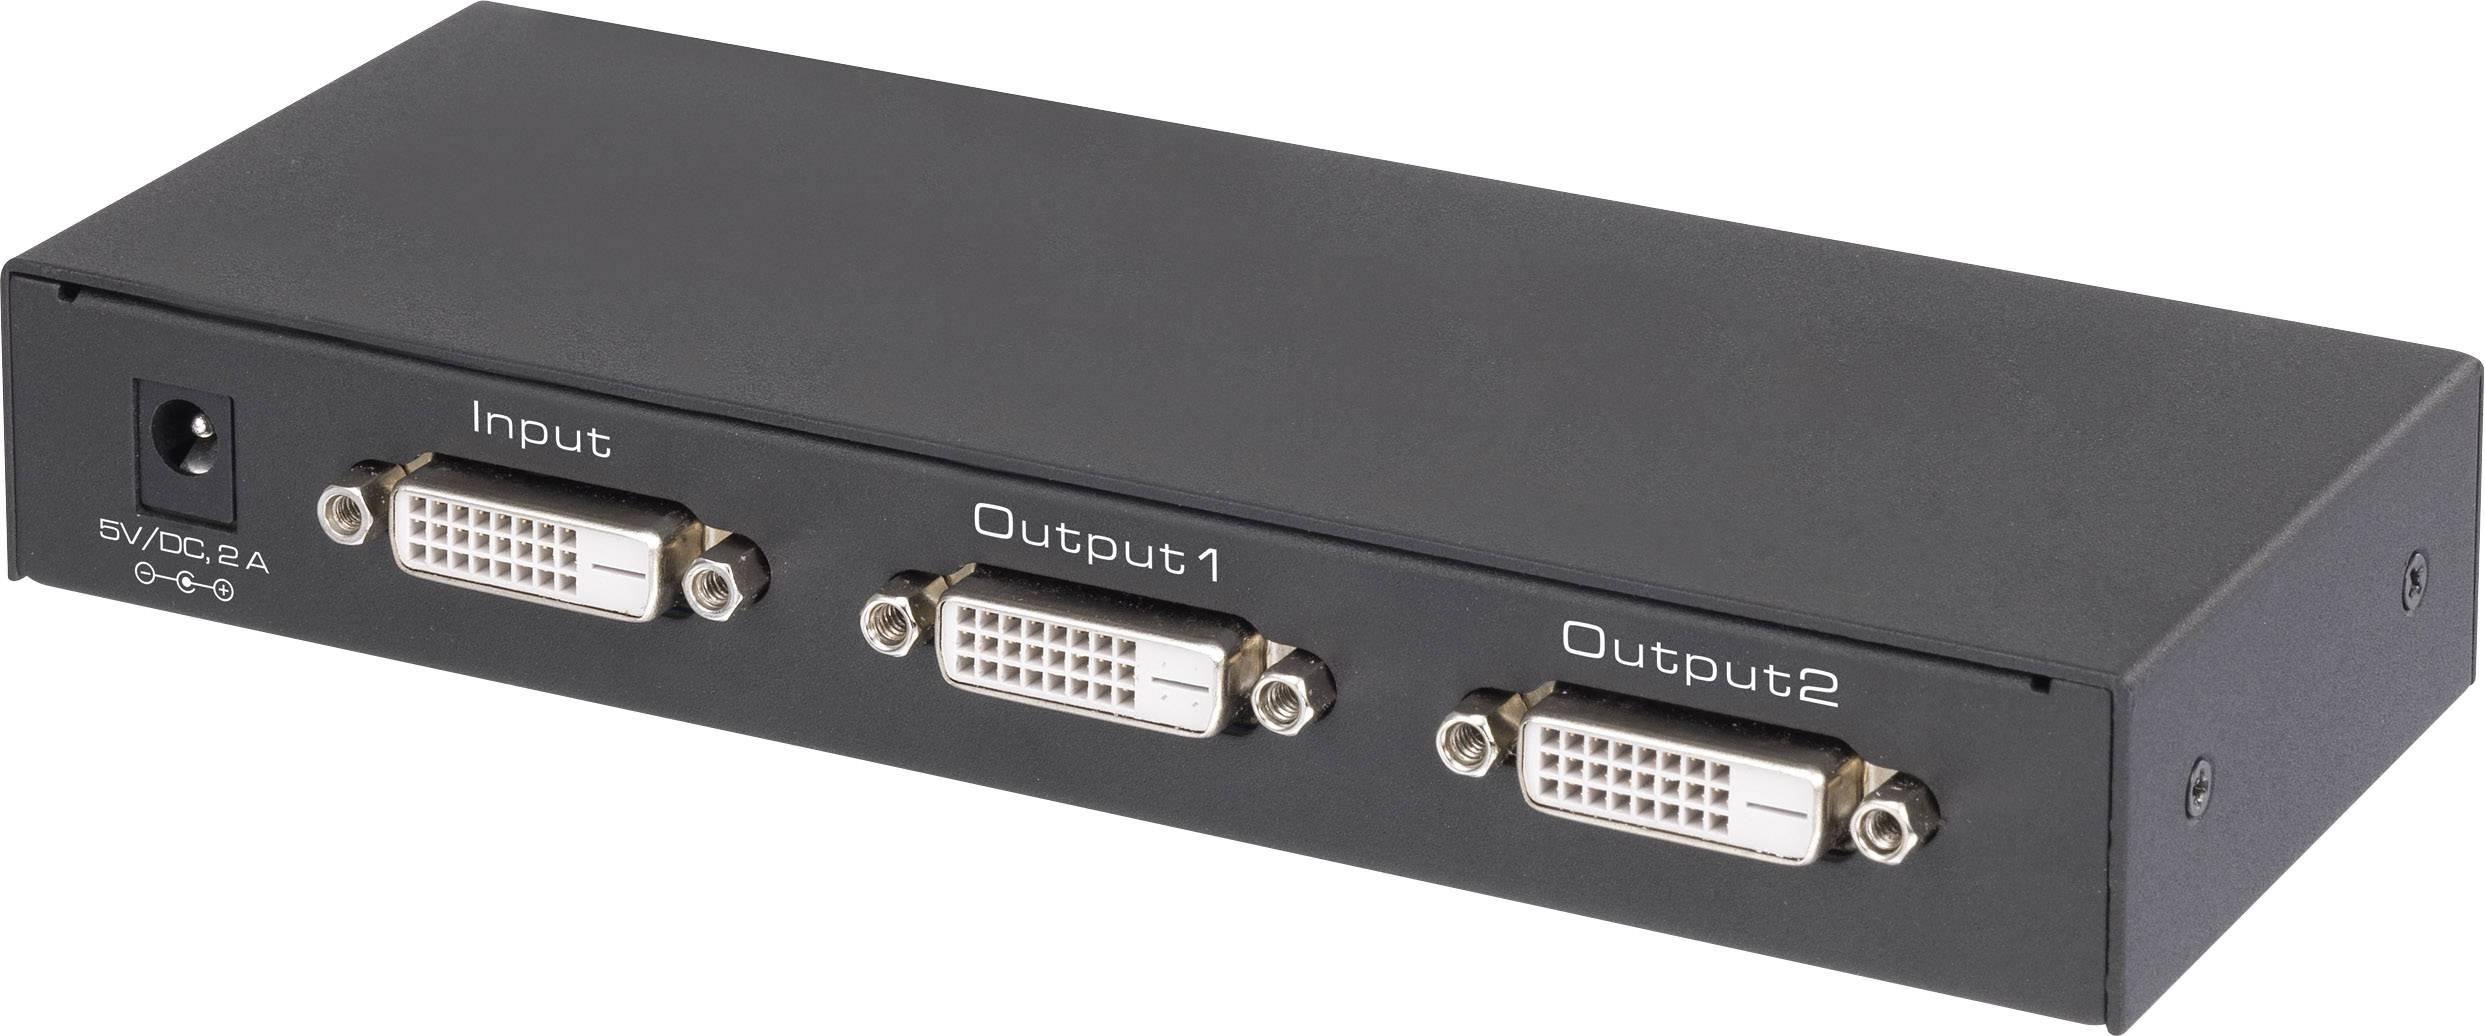 DVI rozbočovač Renkforce N/A, UHD, 2 porty, černá